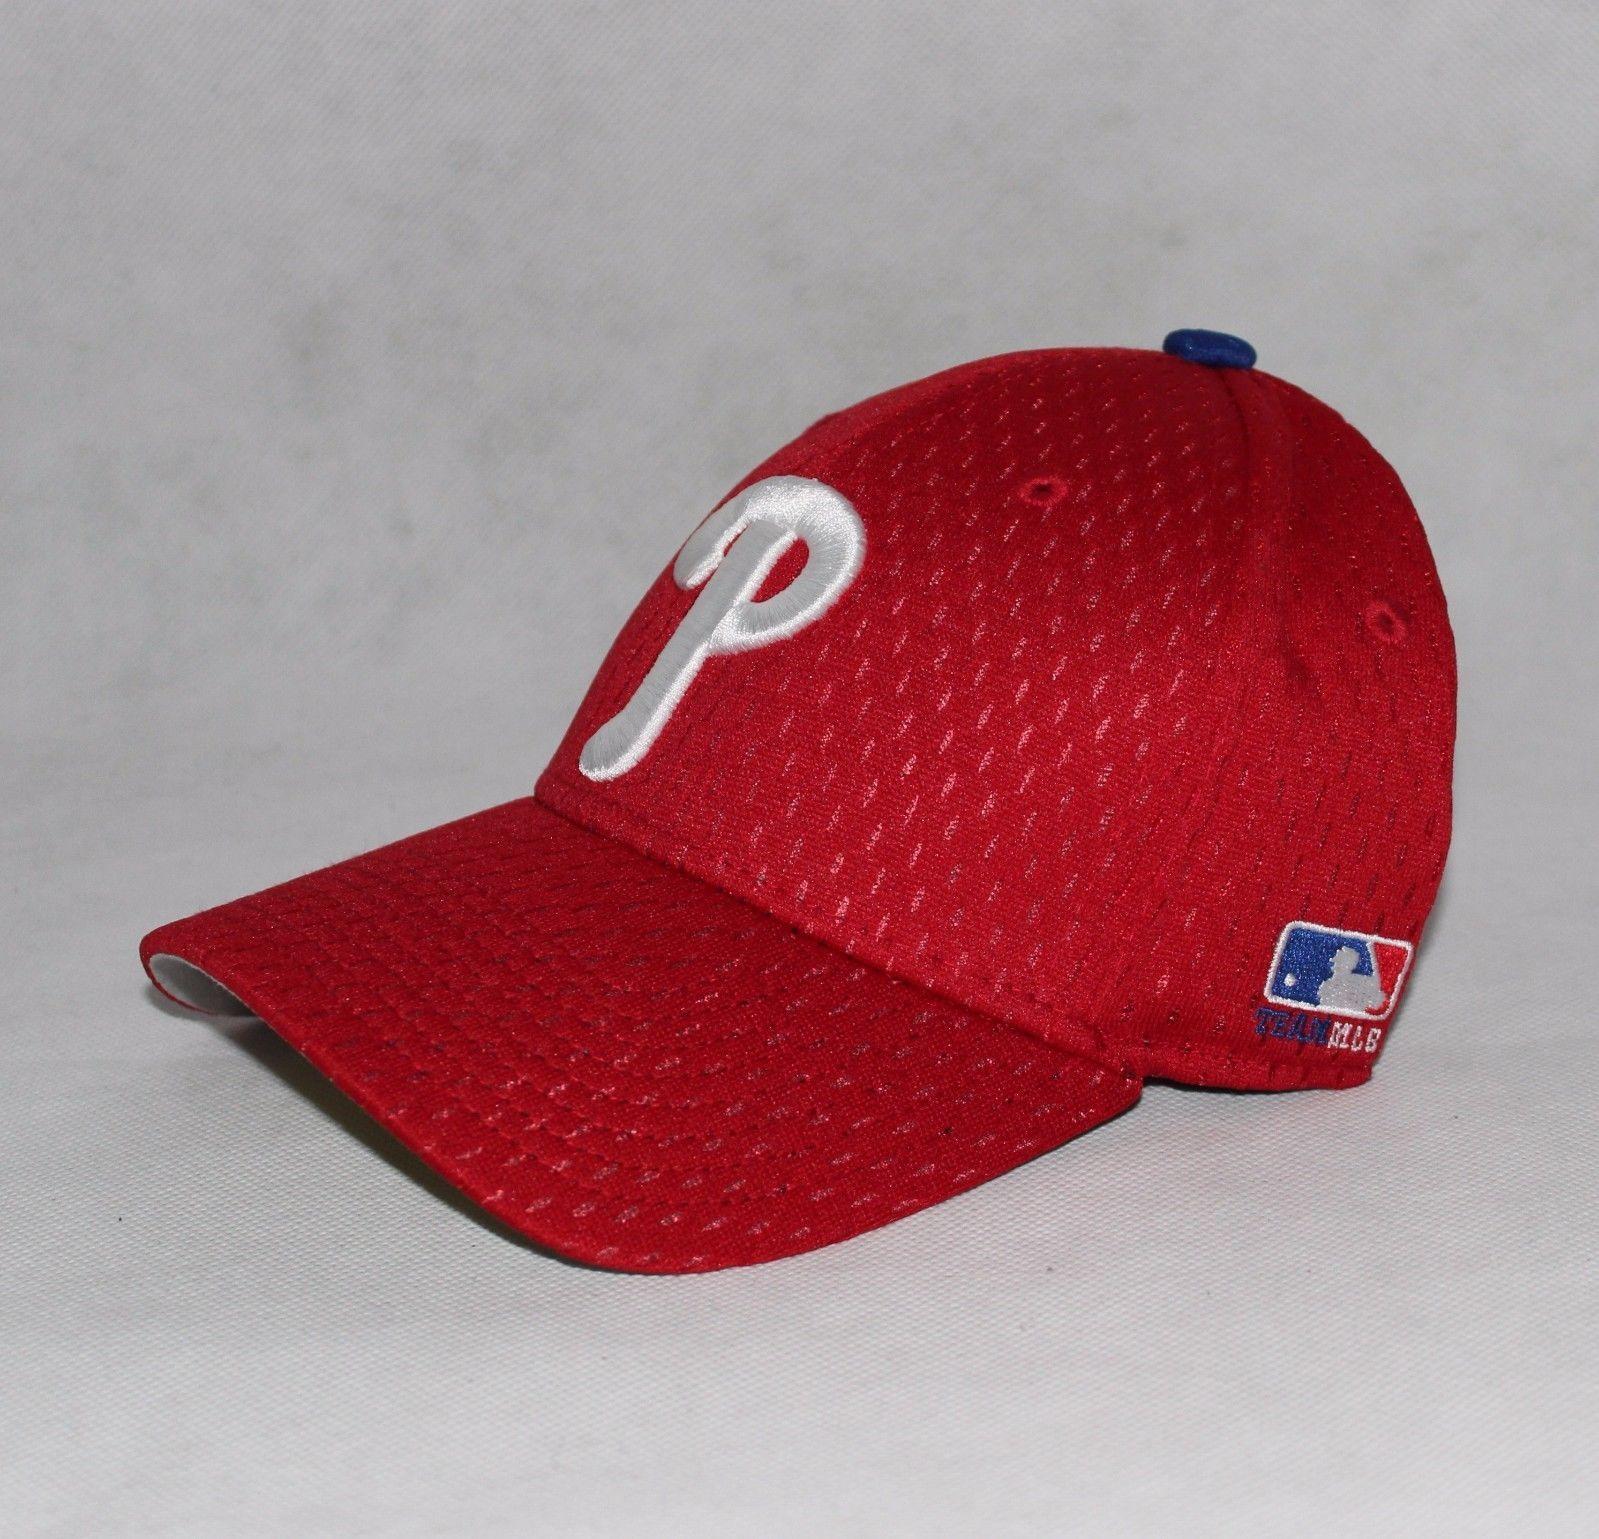 e3568b3b5ce New Philadelphia Phillies MLB replica Baseball Hat Cap OC Sports Adult Red